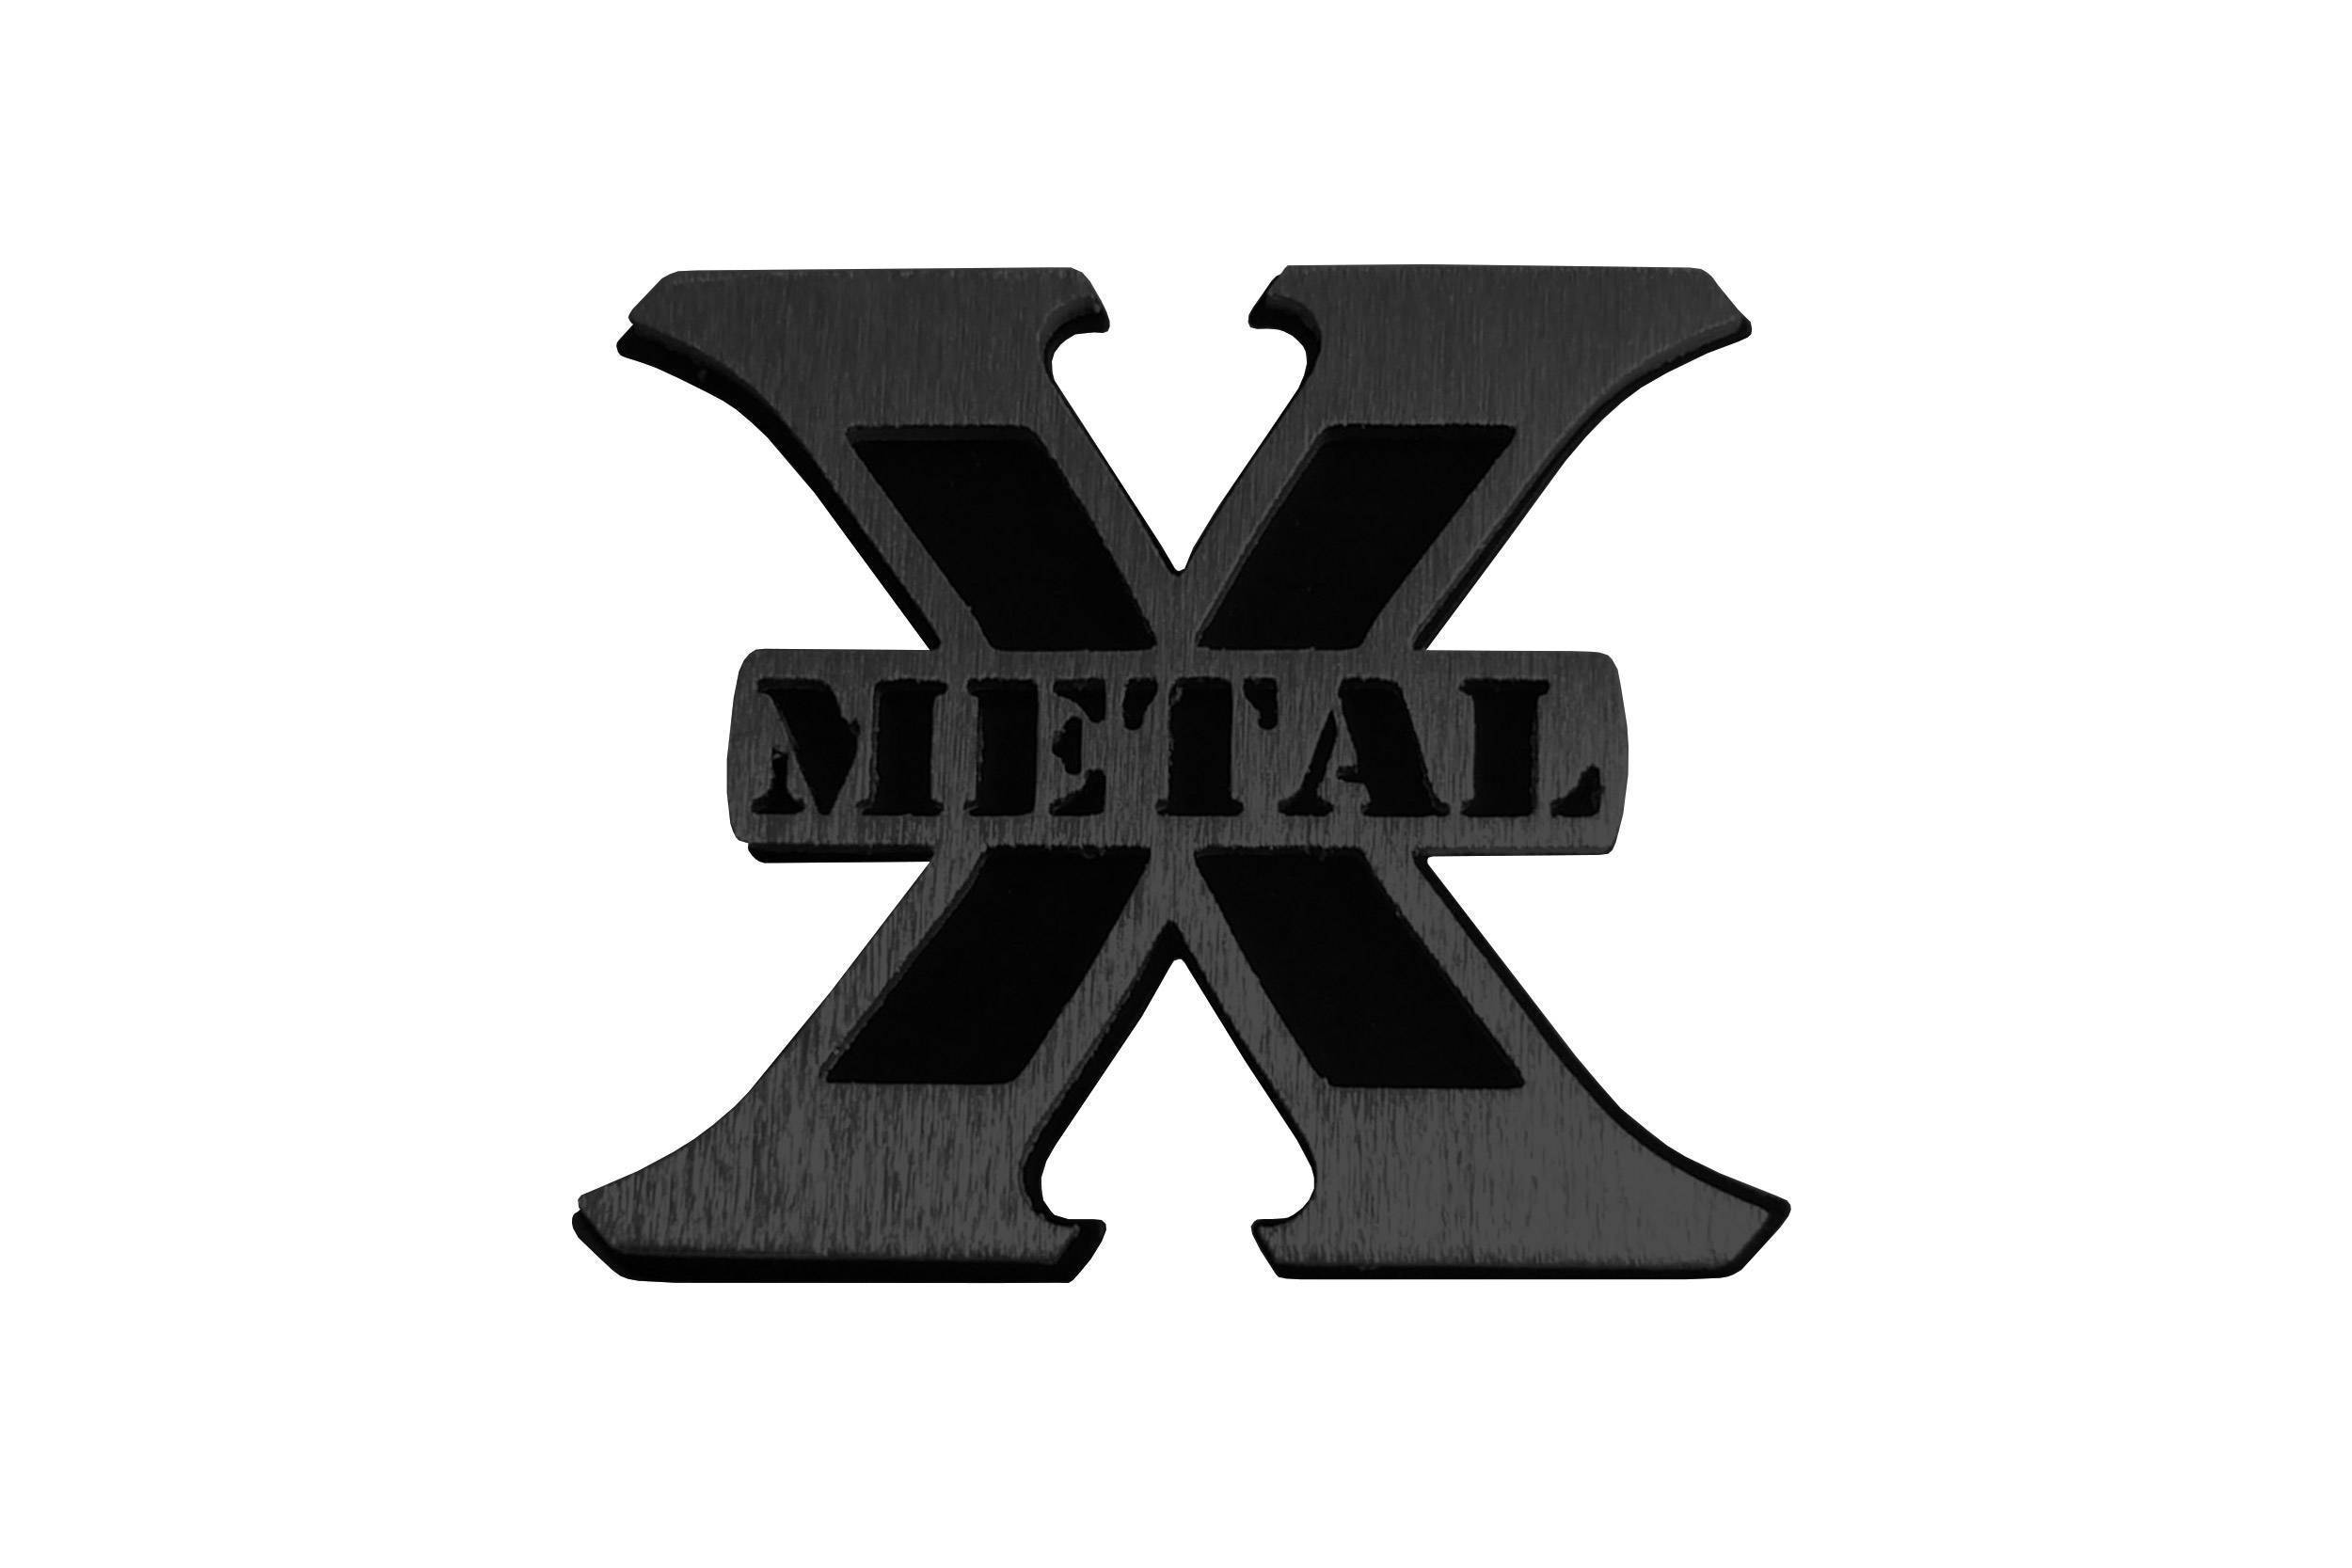 T-REX Grilles - Medium Black X-Metal Logo, 4 1/4 Inch Height x 5 Inch Wide - PN #6710016B